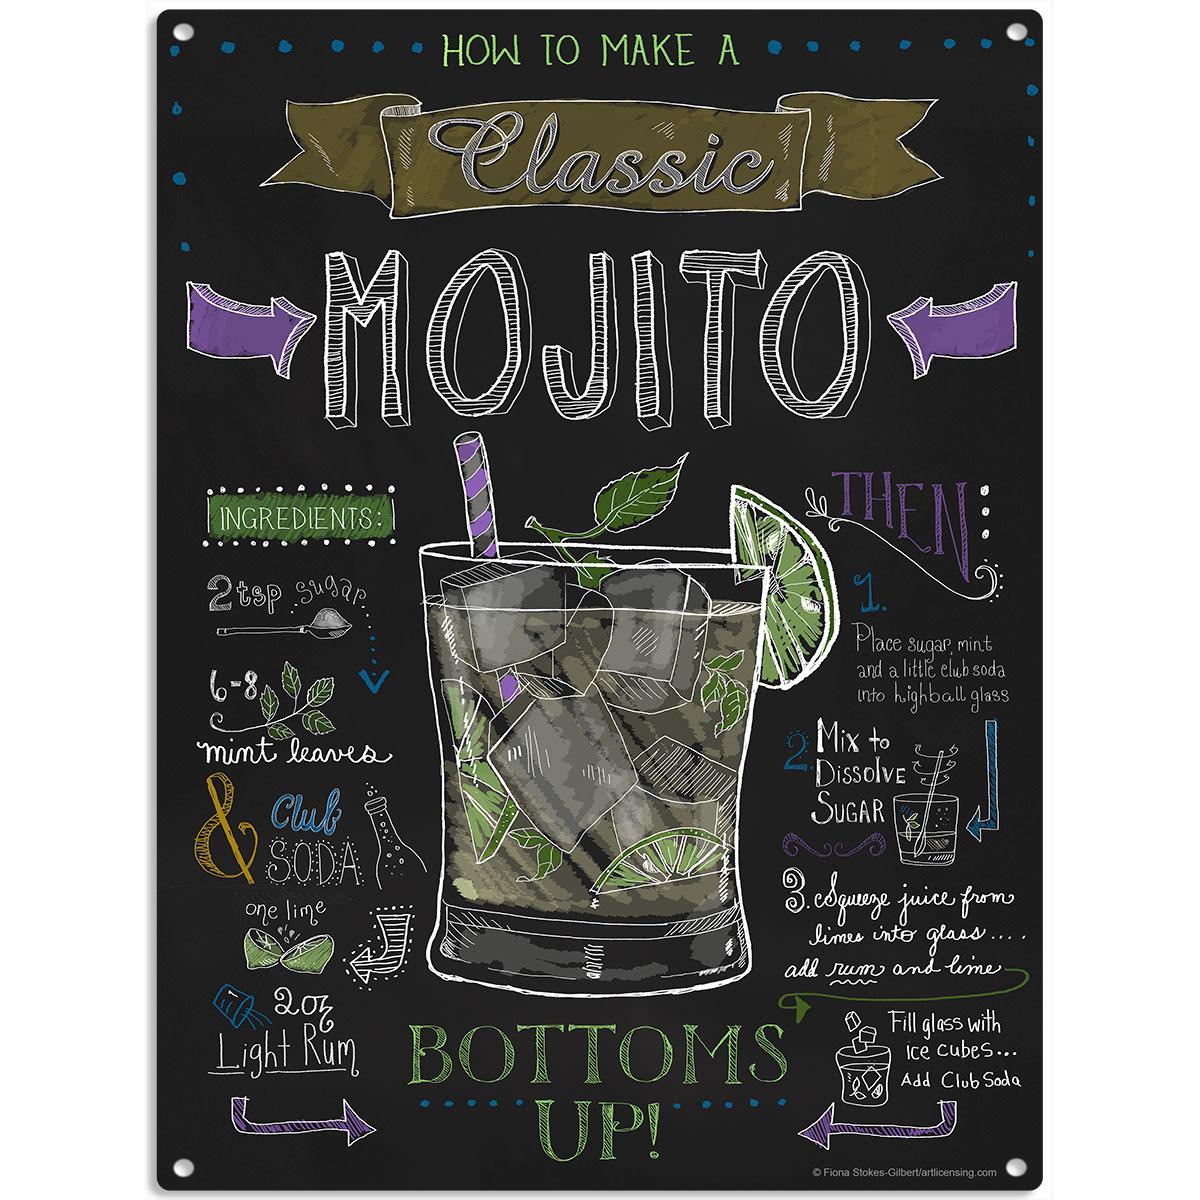 Mojito recipe chalkboard style sign vintage style bar decor 12 x 16 ebay - Pizarras de bar ...